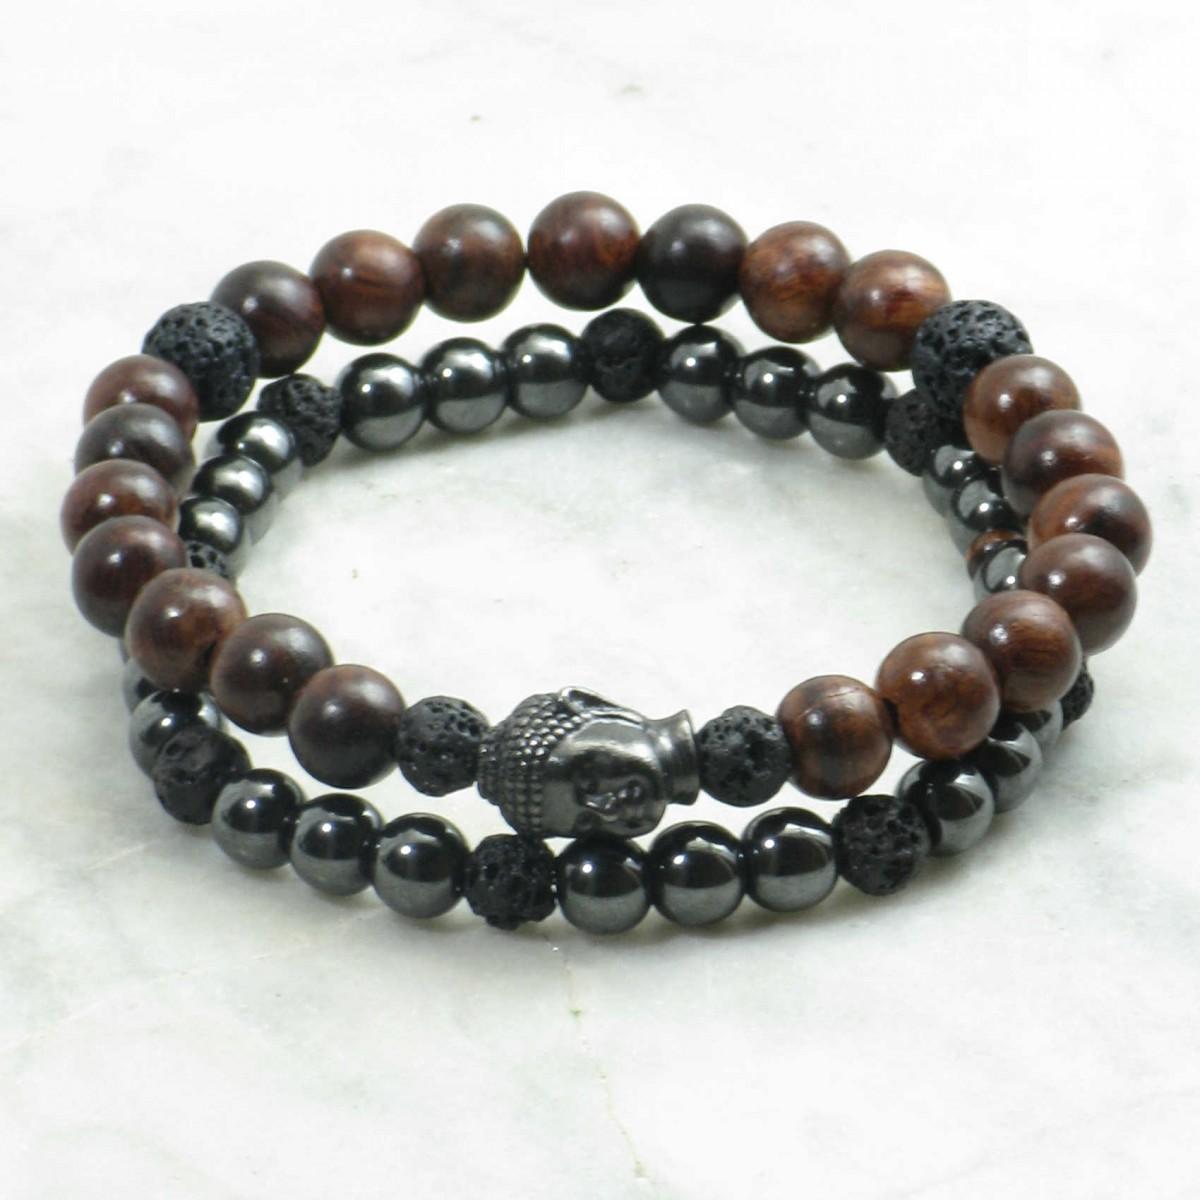 Sankalpa_Bracelets_for_Men_Mala_Beads_Stacks_Rosewood_Hematite_Lava_Buddhist_Prayer_Beads